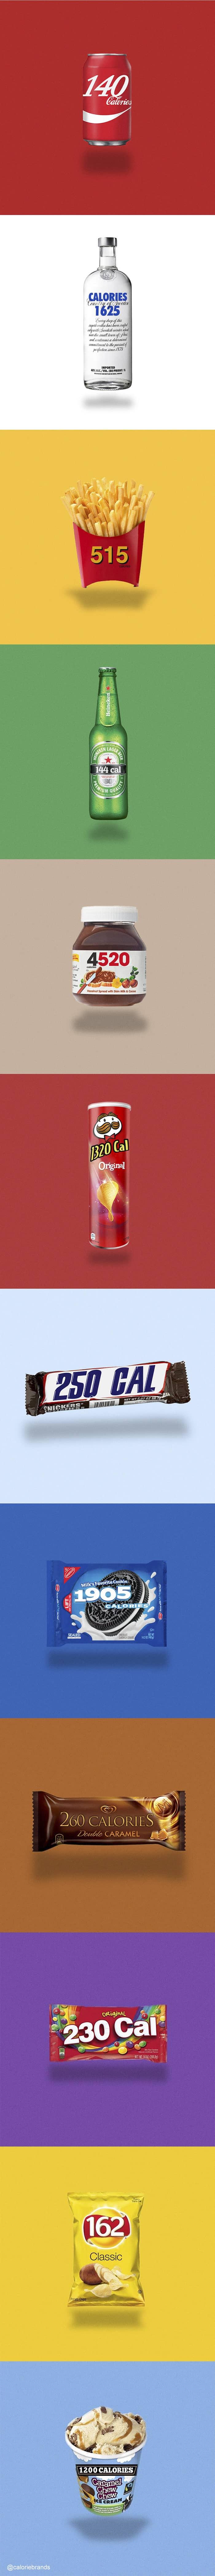 CalorieBrands 0